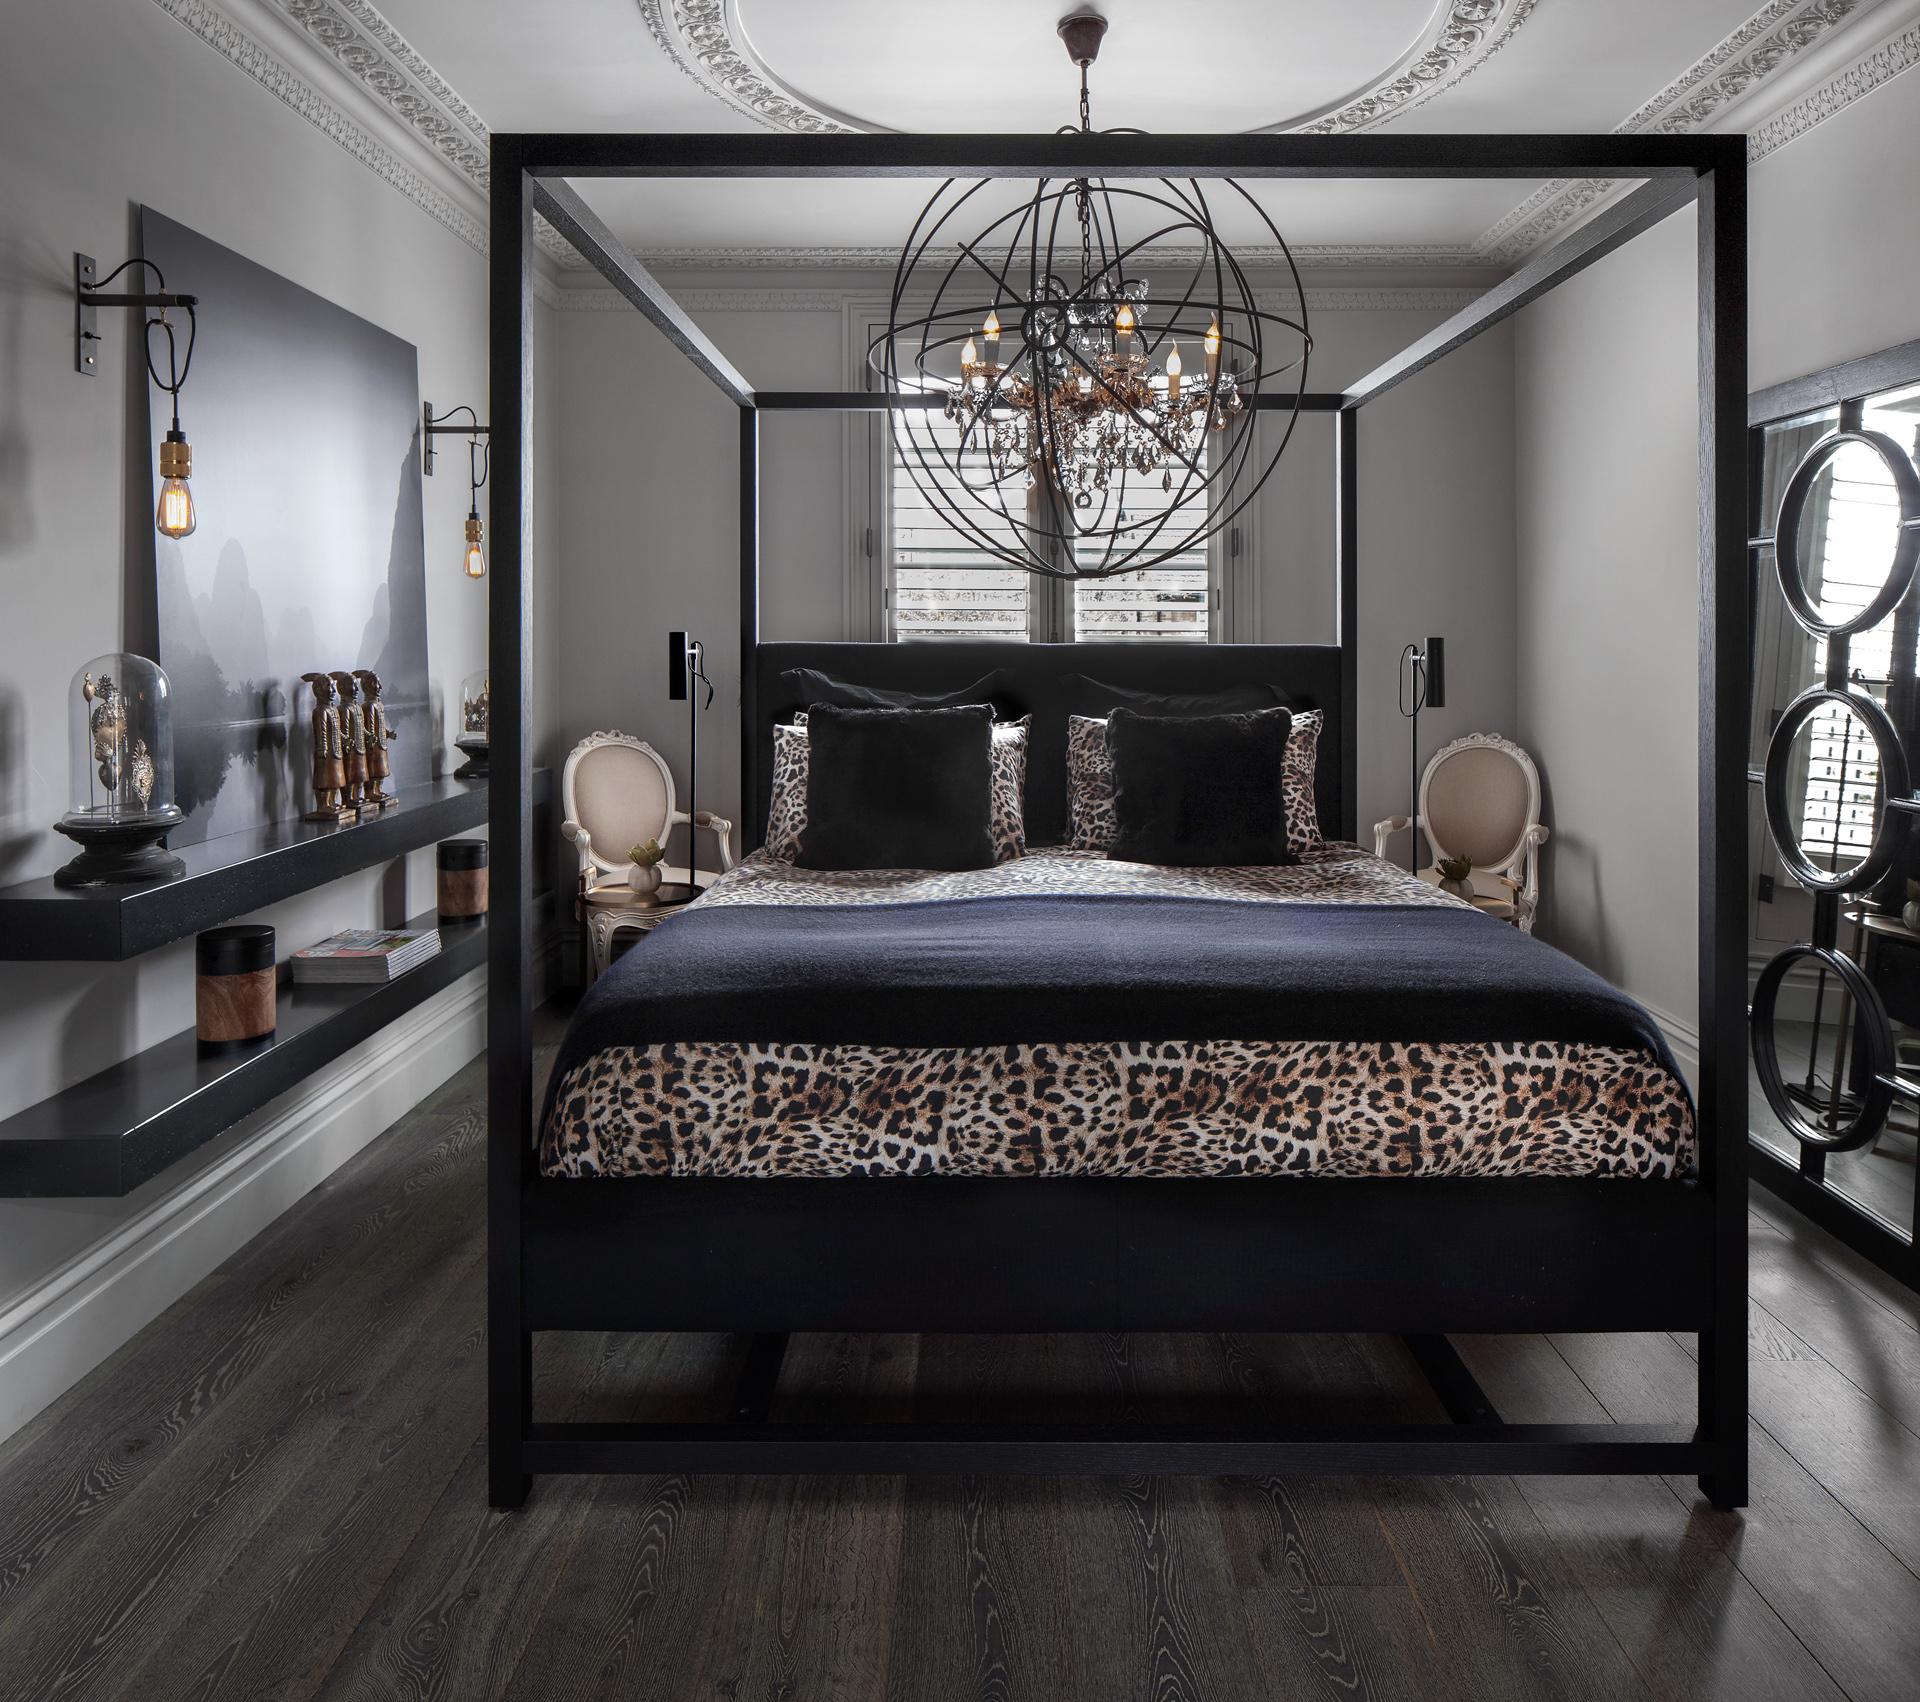 спальня лепнина кровать балдахин люстра  потолок молдинги